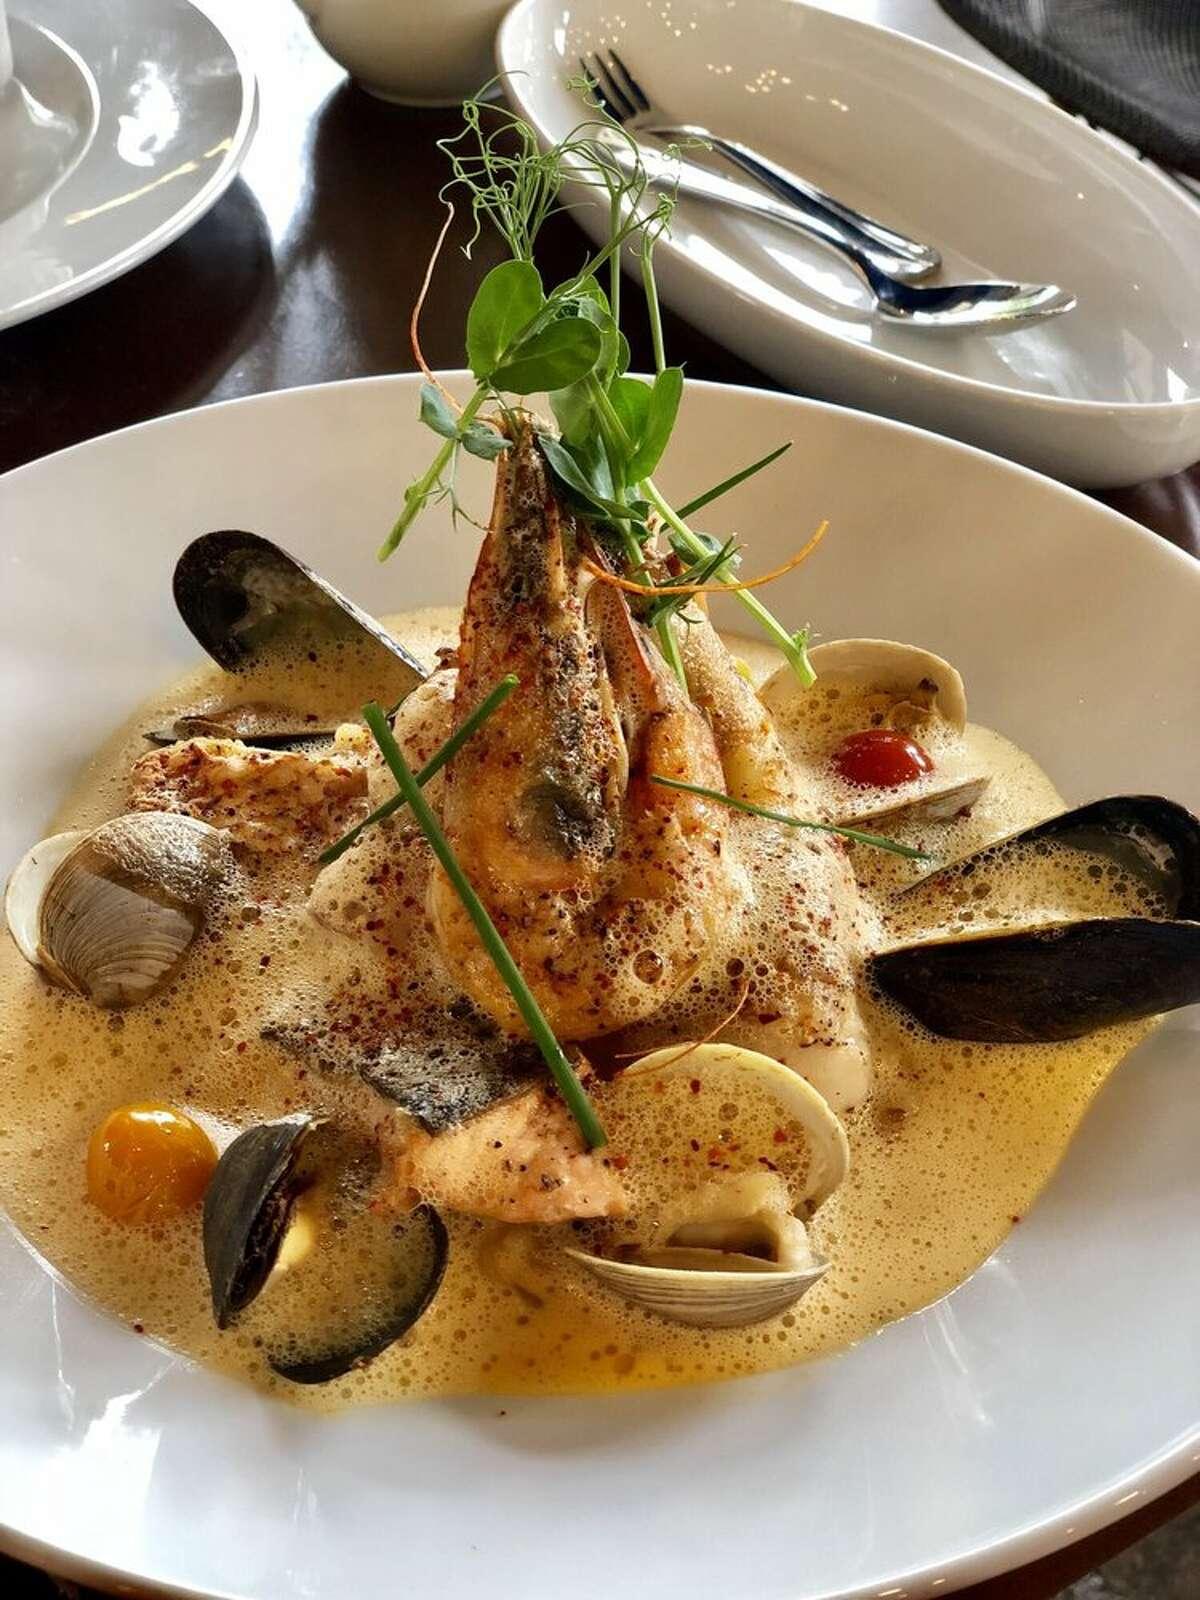 Maison Pucha Bistro 1001 Studewood Street, Ste. A, HoustonLRW lunch menu: $25LRW dinner menu: $45 Photo by: Maggie G/Yelp